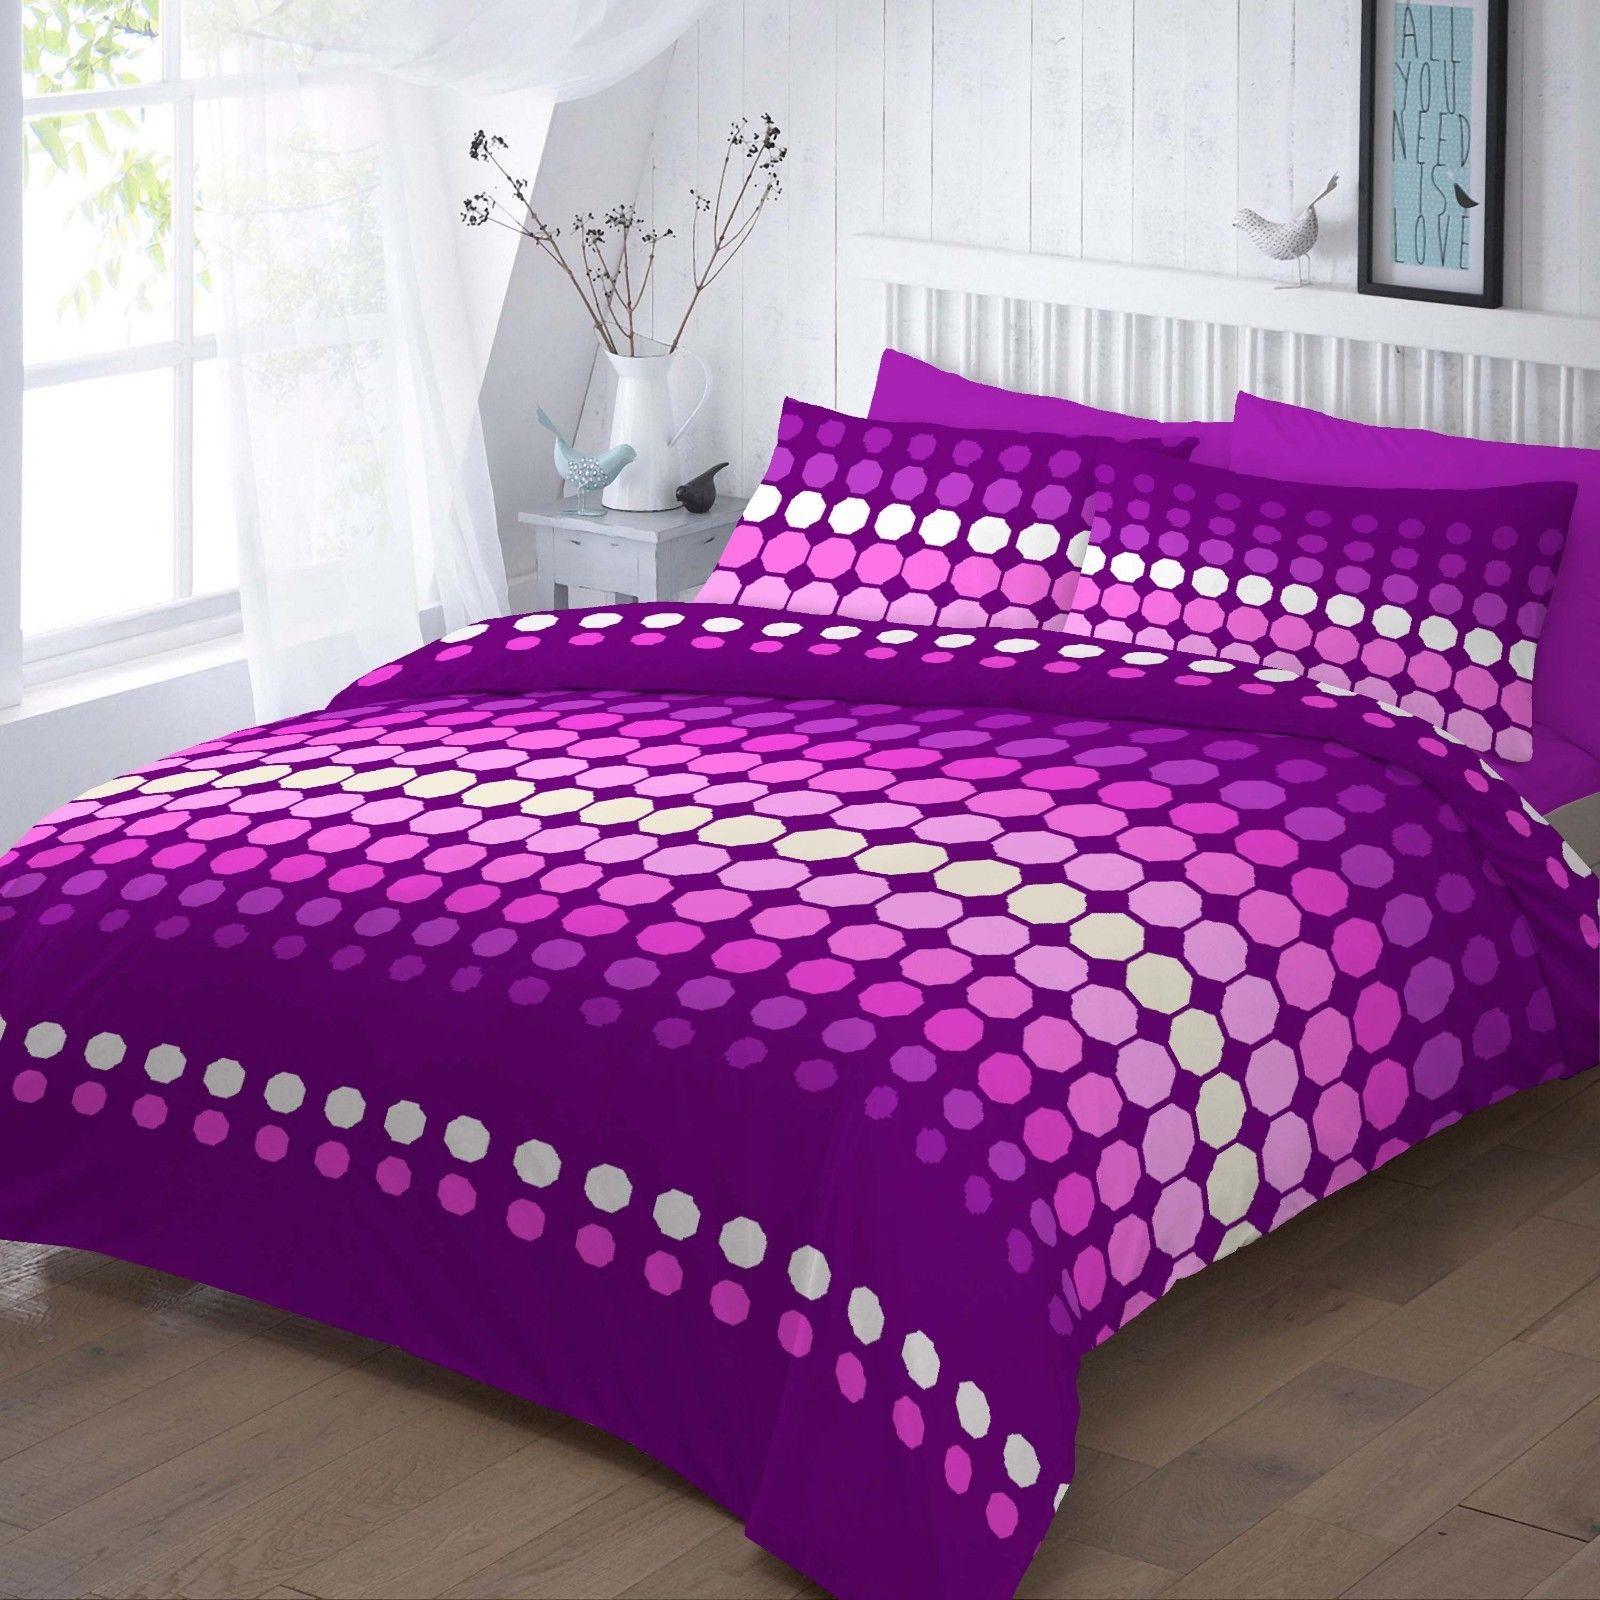 hudson duvet cover set wholesale bedding store de lavish. Black Bedroom Furniture Sets. Home Design Ideas